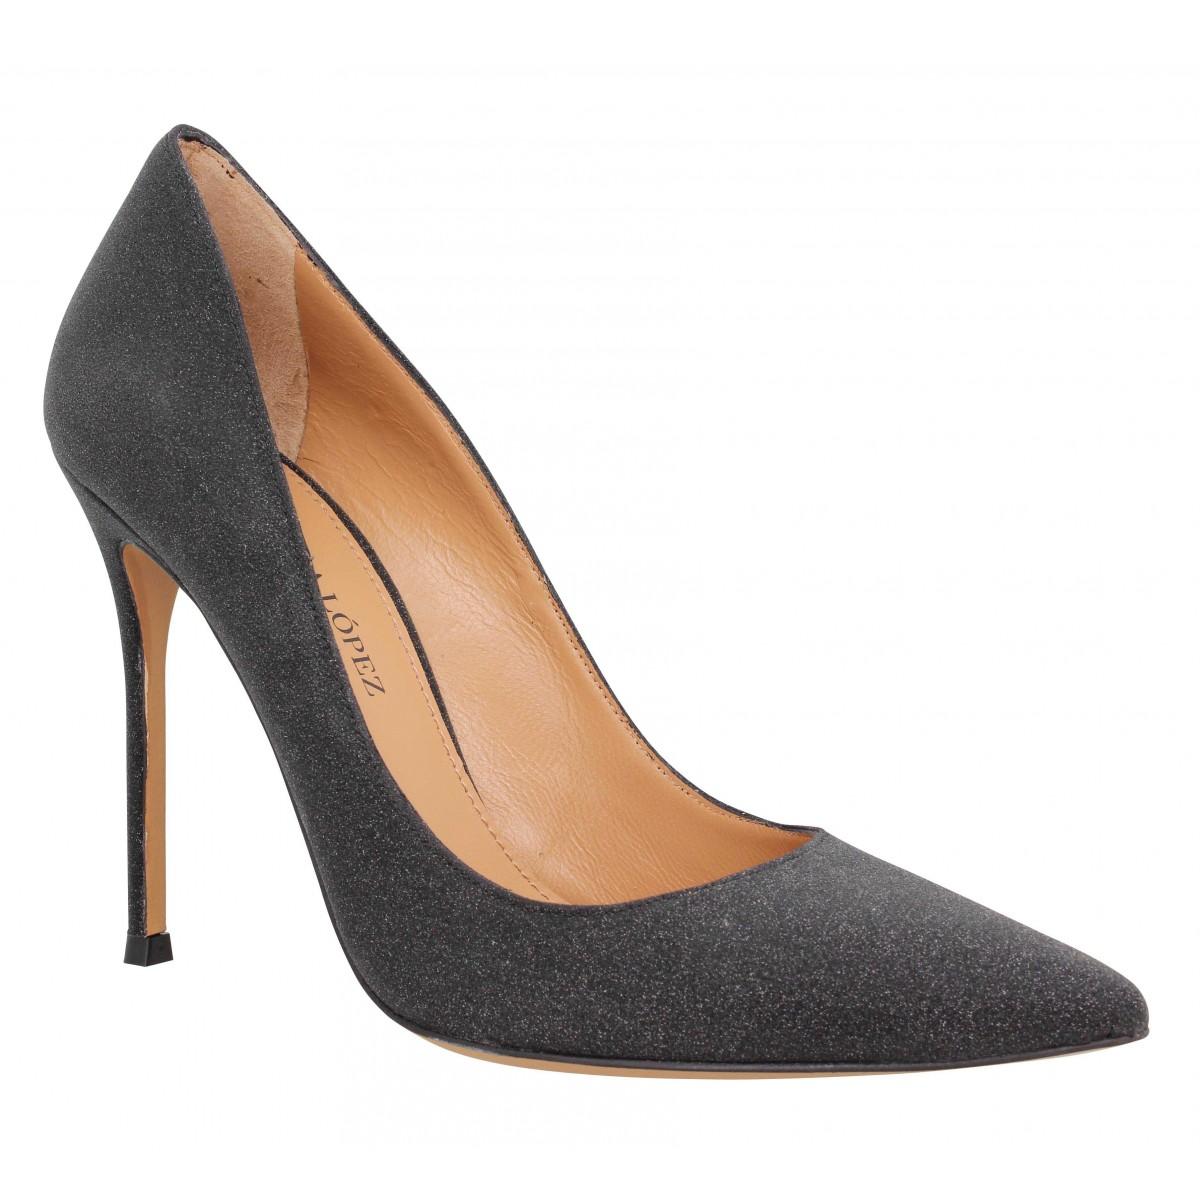 Escarpins PURA LOPEZ 107 glitter Femme Noir